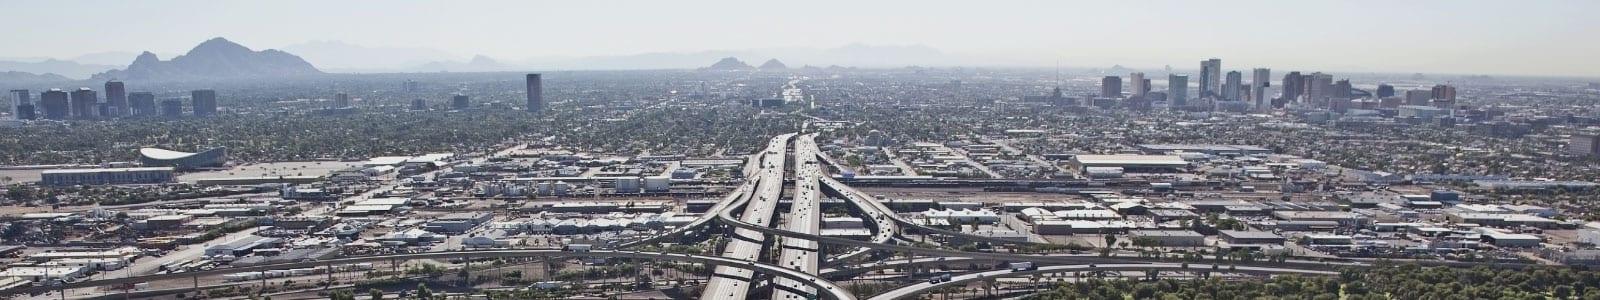 highway birds eye view near phoenix az